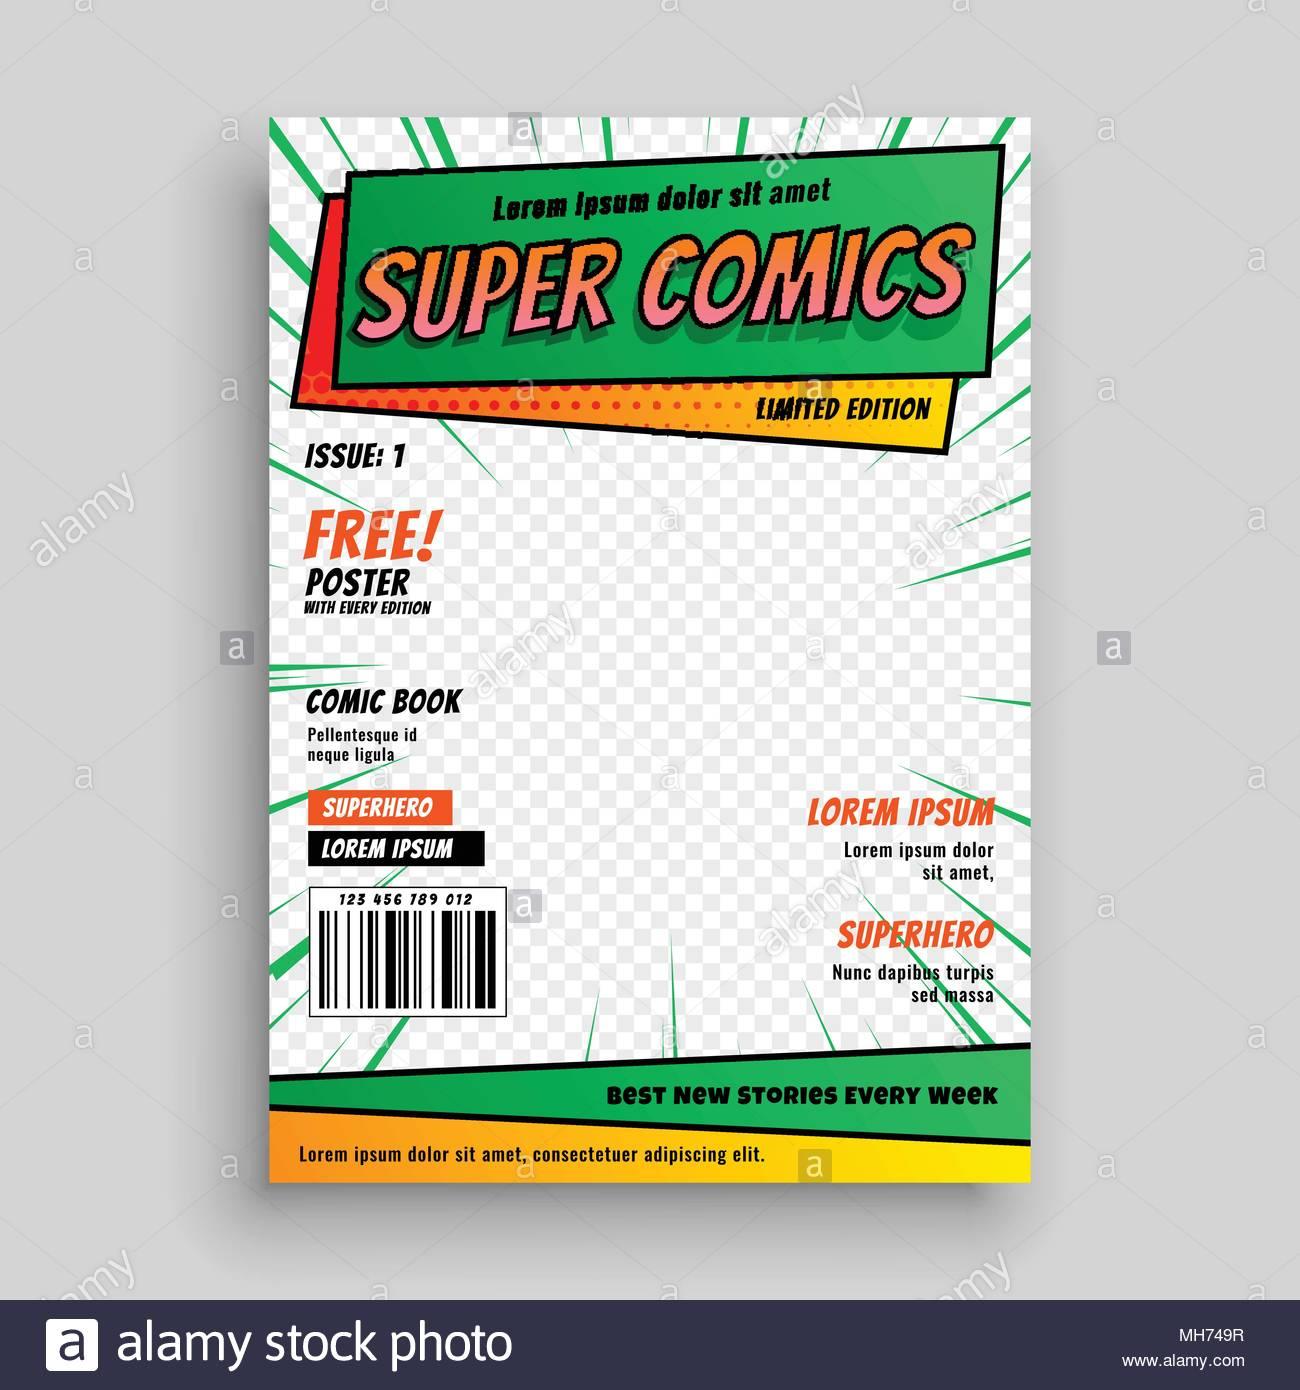 Comic Book Stockfotos & Comic Book Bilder - Alamy